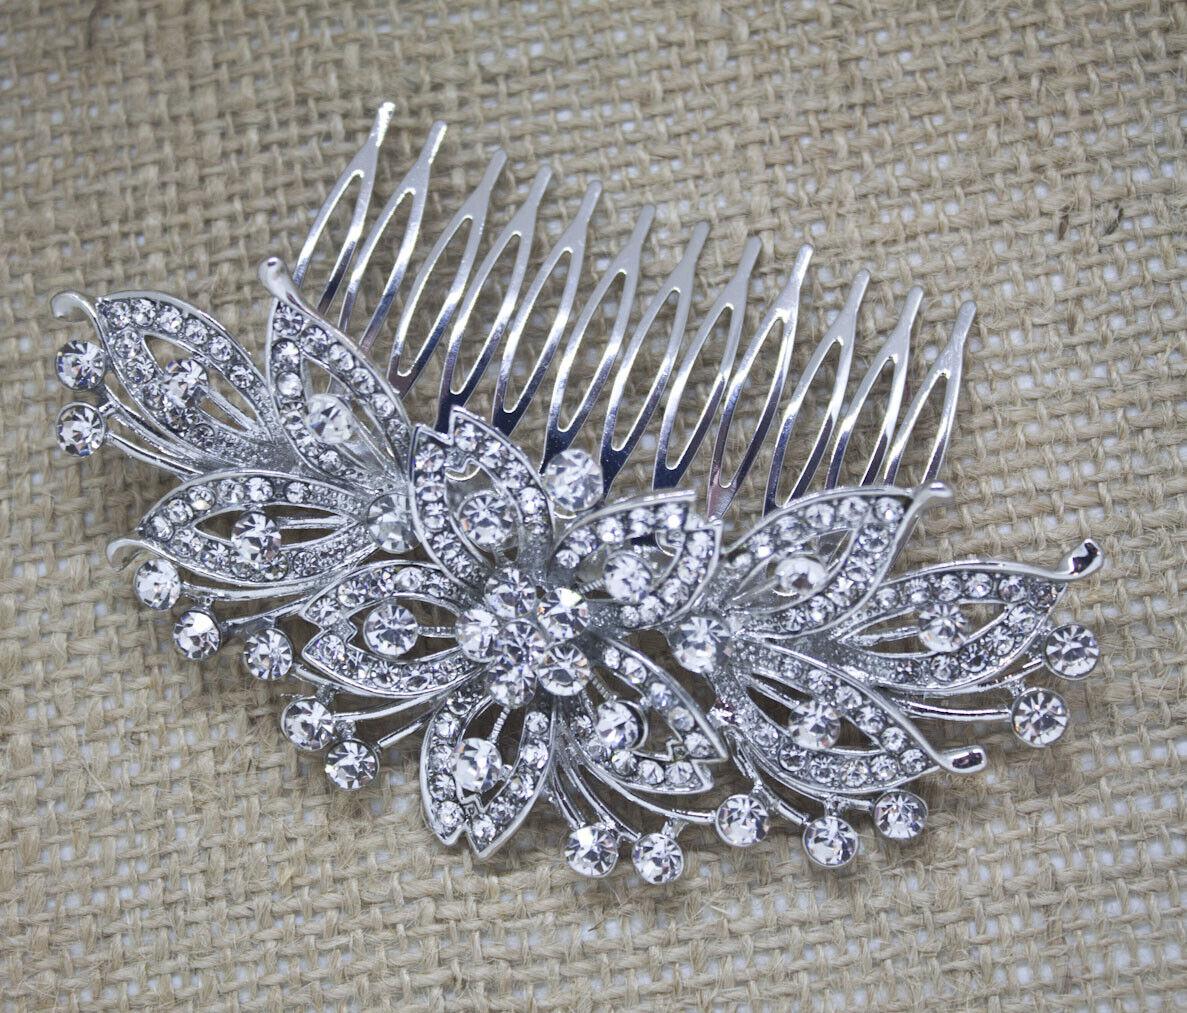 Silver tone hair comb bridal wedding crystal rhinestone hair accessories ha4867